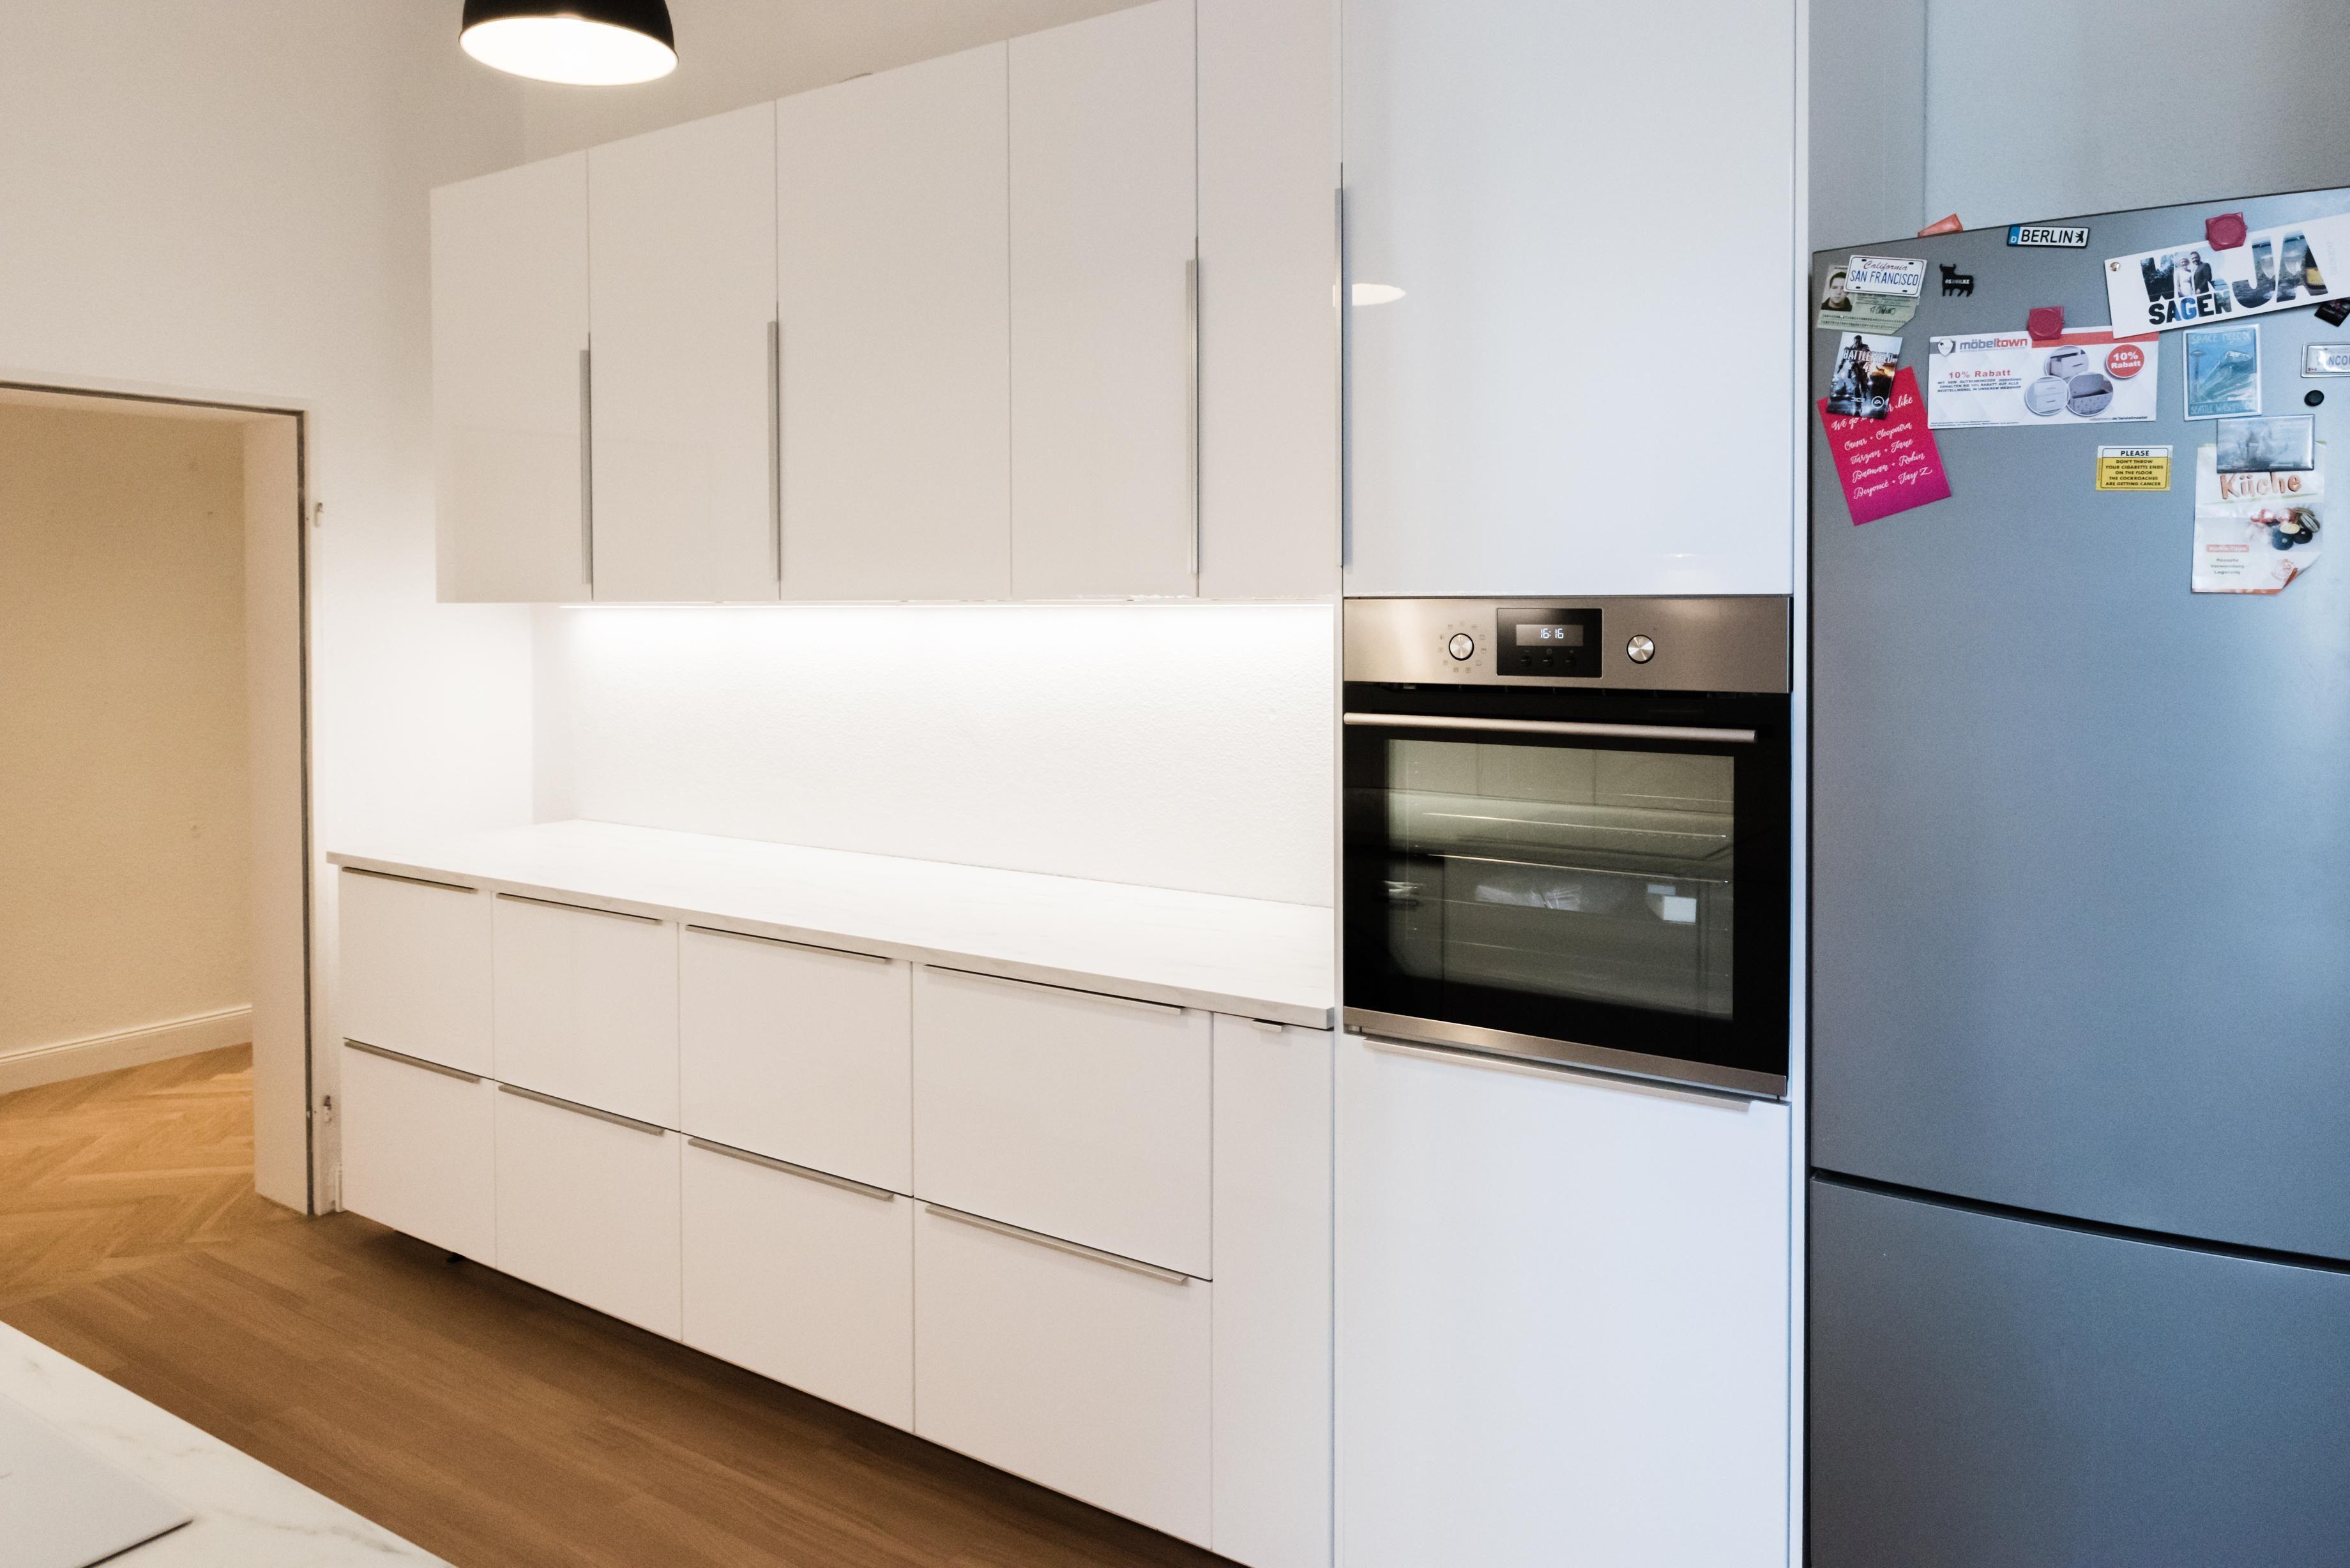 Metod Keuken Ikea : Ikea küchen märsta. mülleimer küche schmal selber bauen ideen